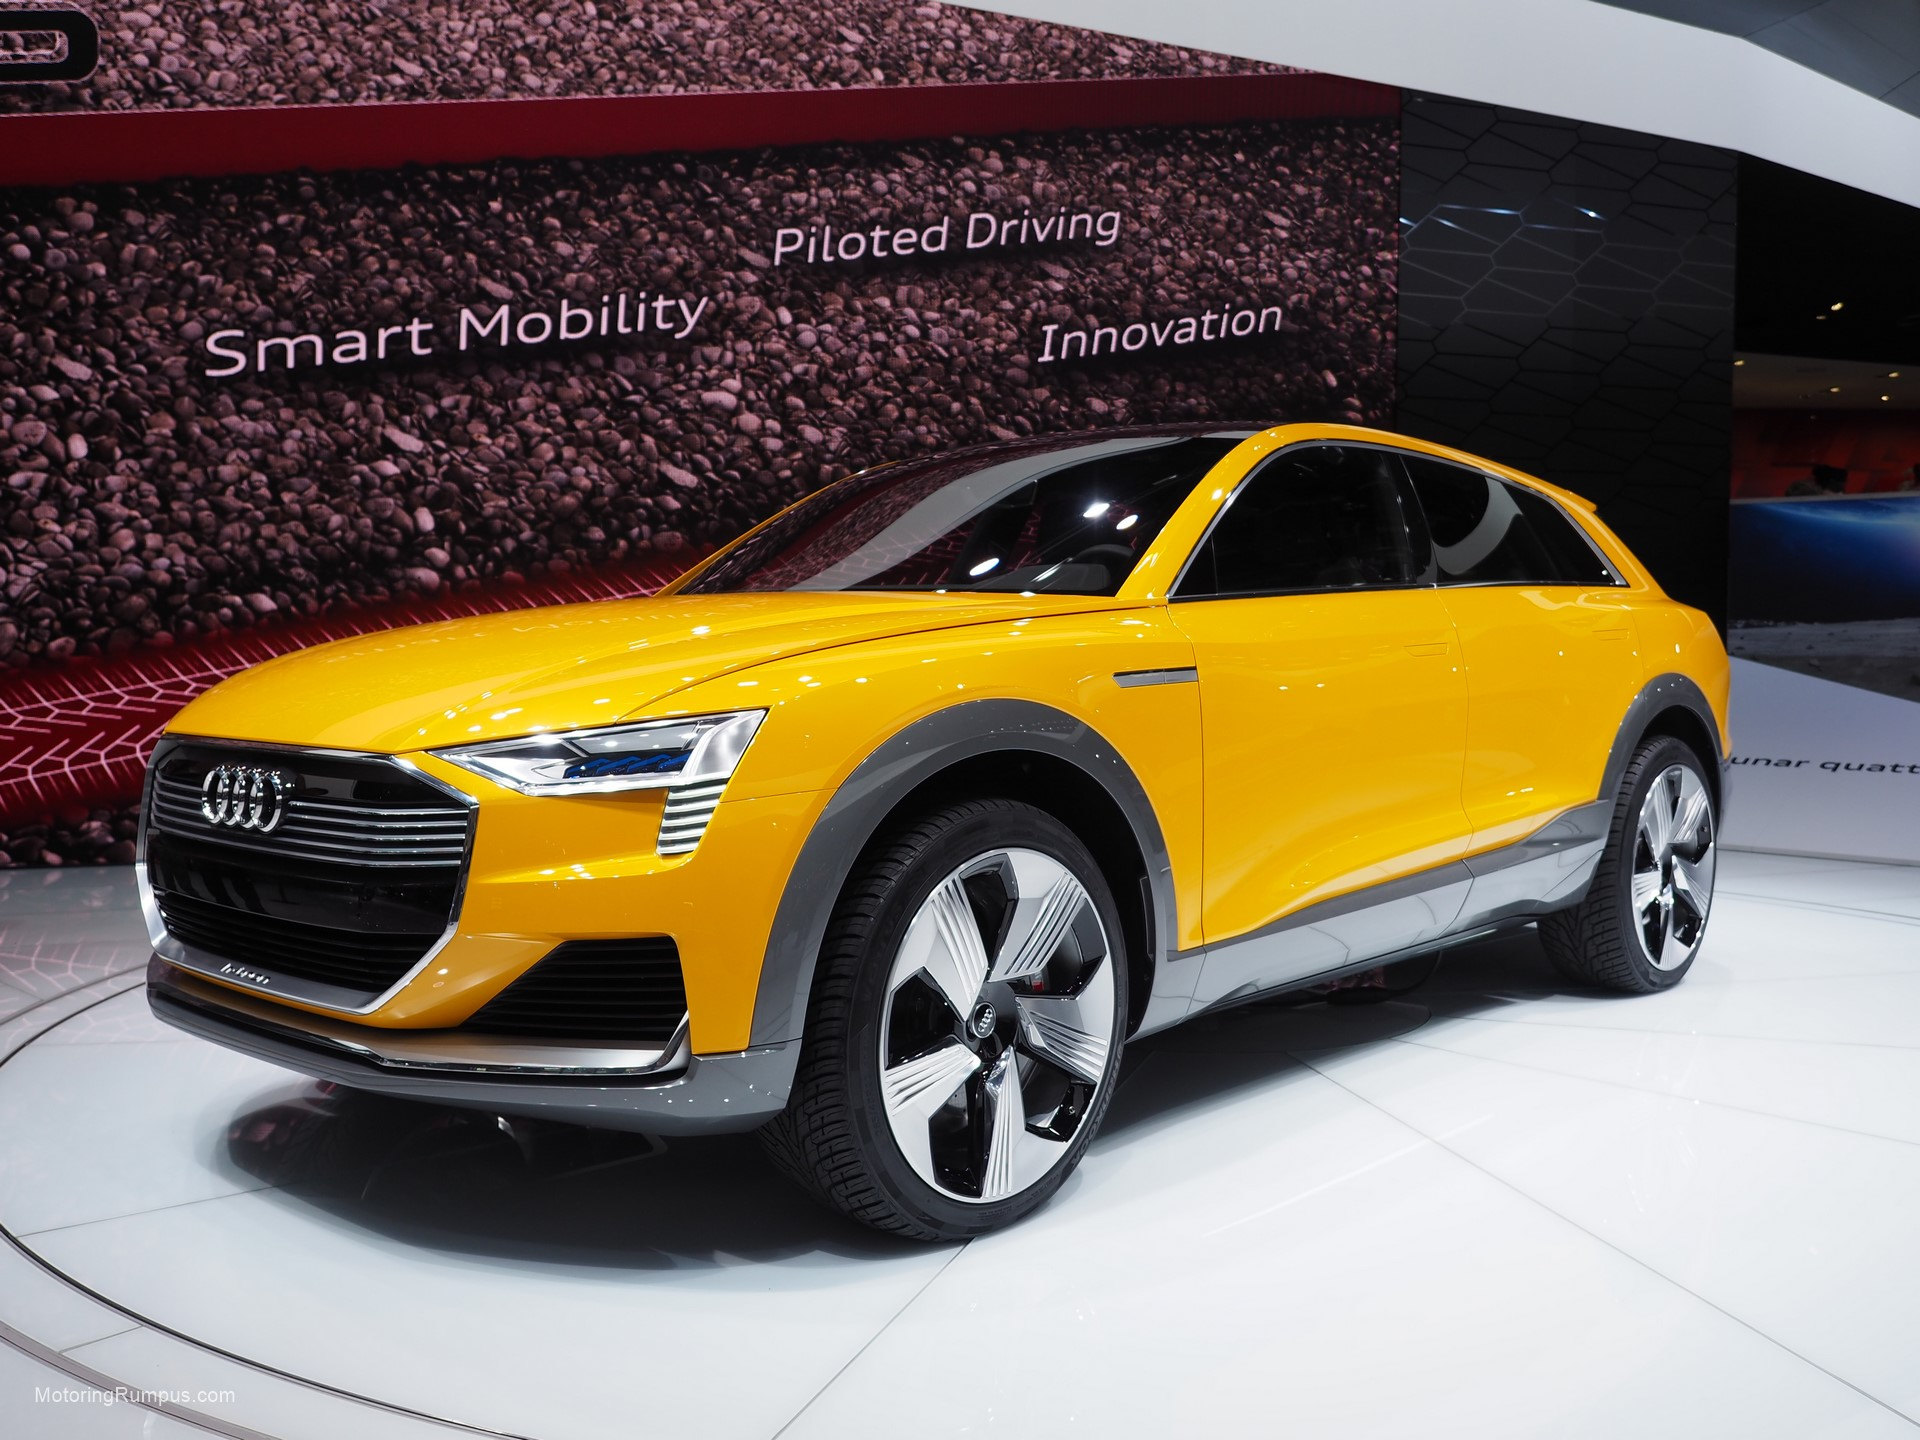 2016 NAIAS Audi h-tron quattro concept